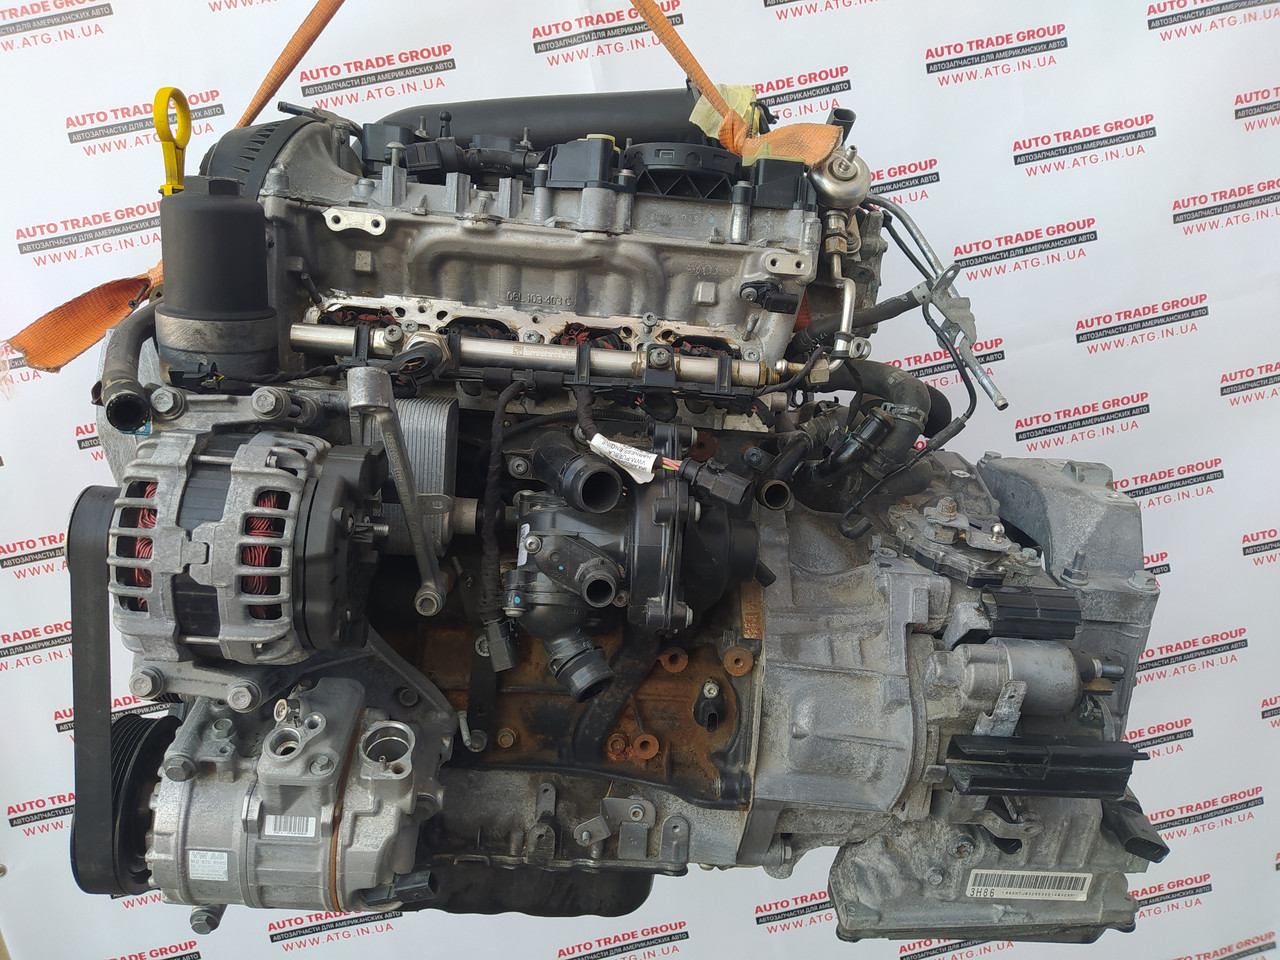 Двигун VW Jetta 1.4 Т мкпп 2018-2021 24к 04E-100-037-H